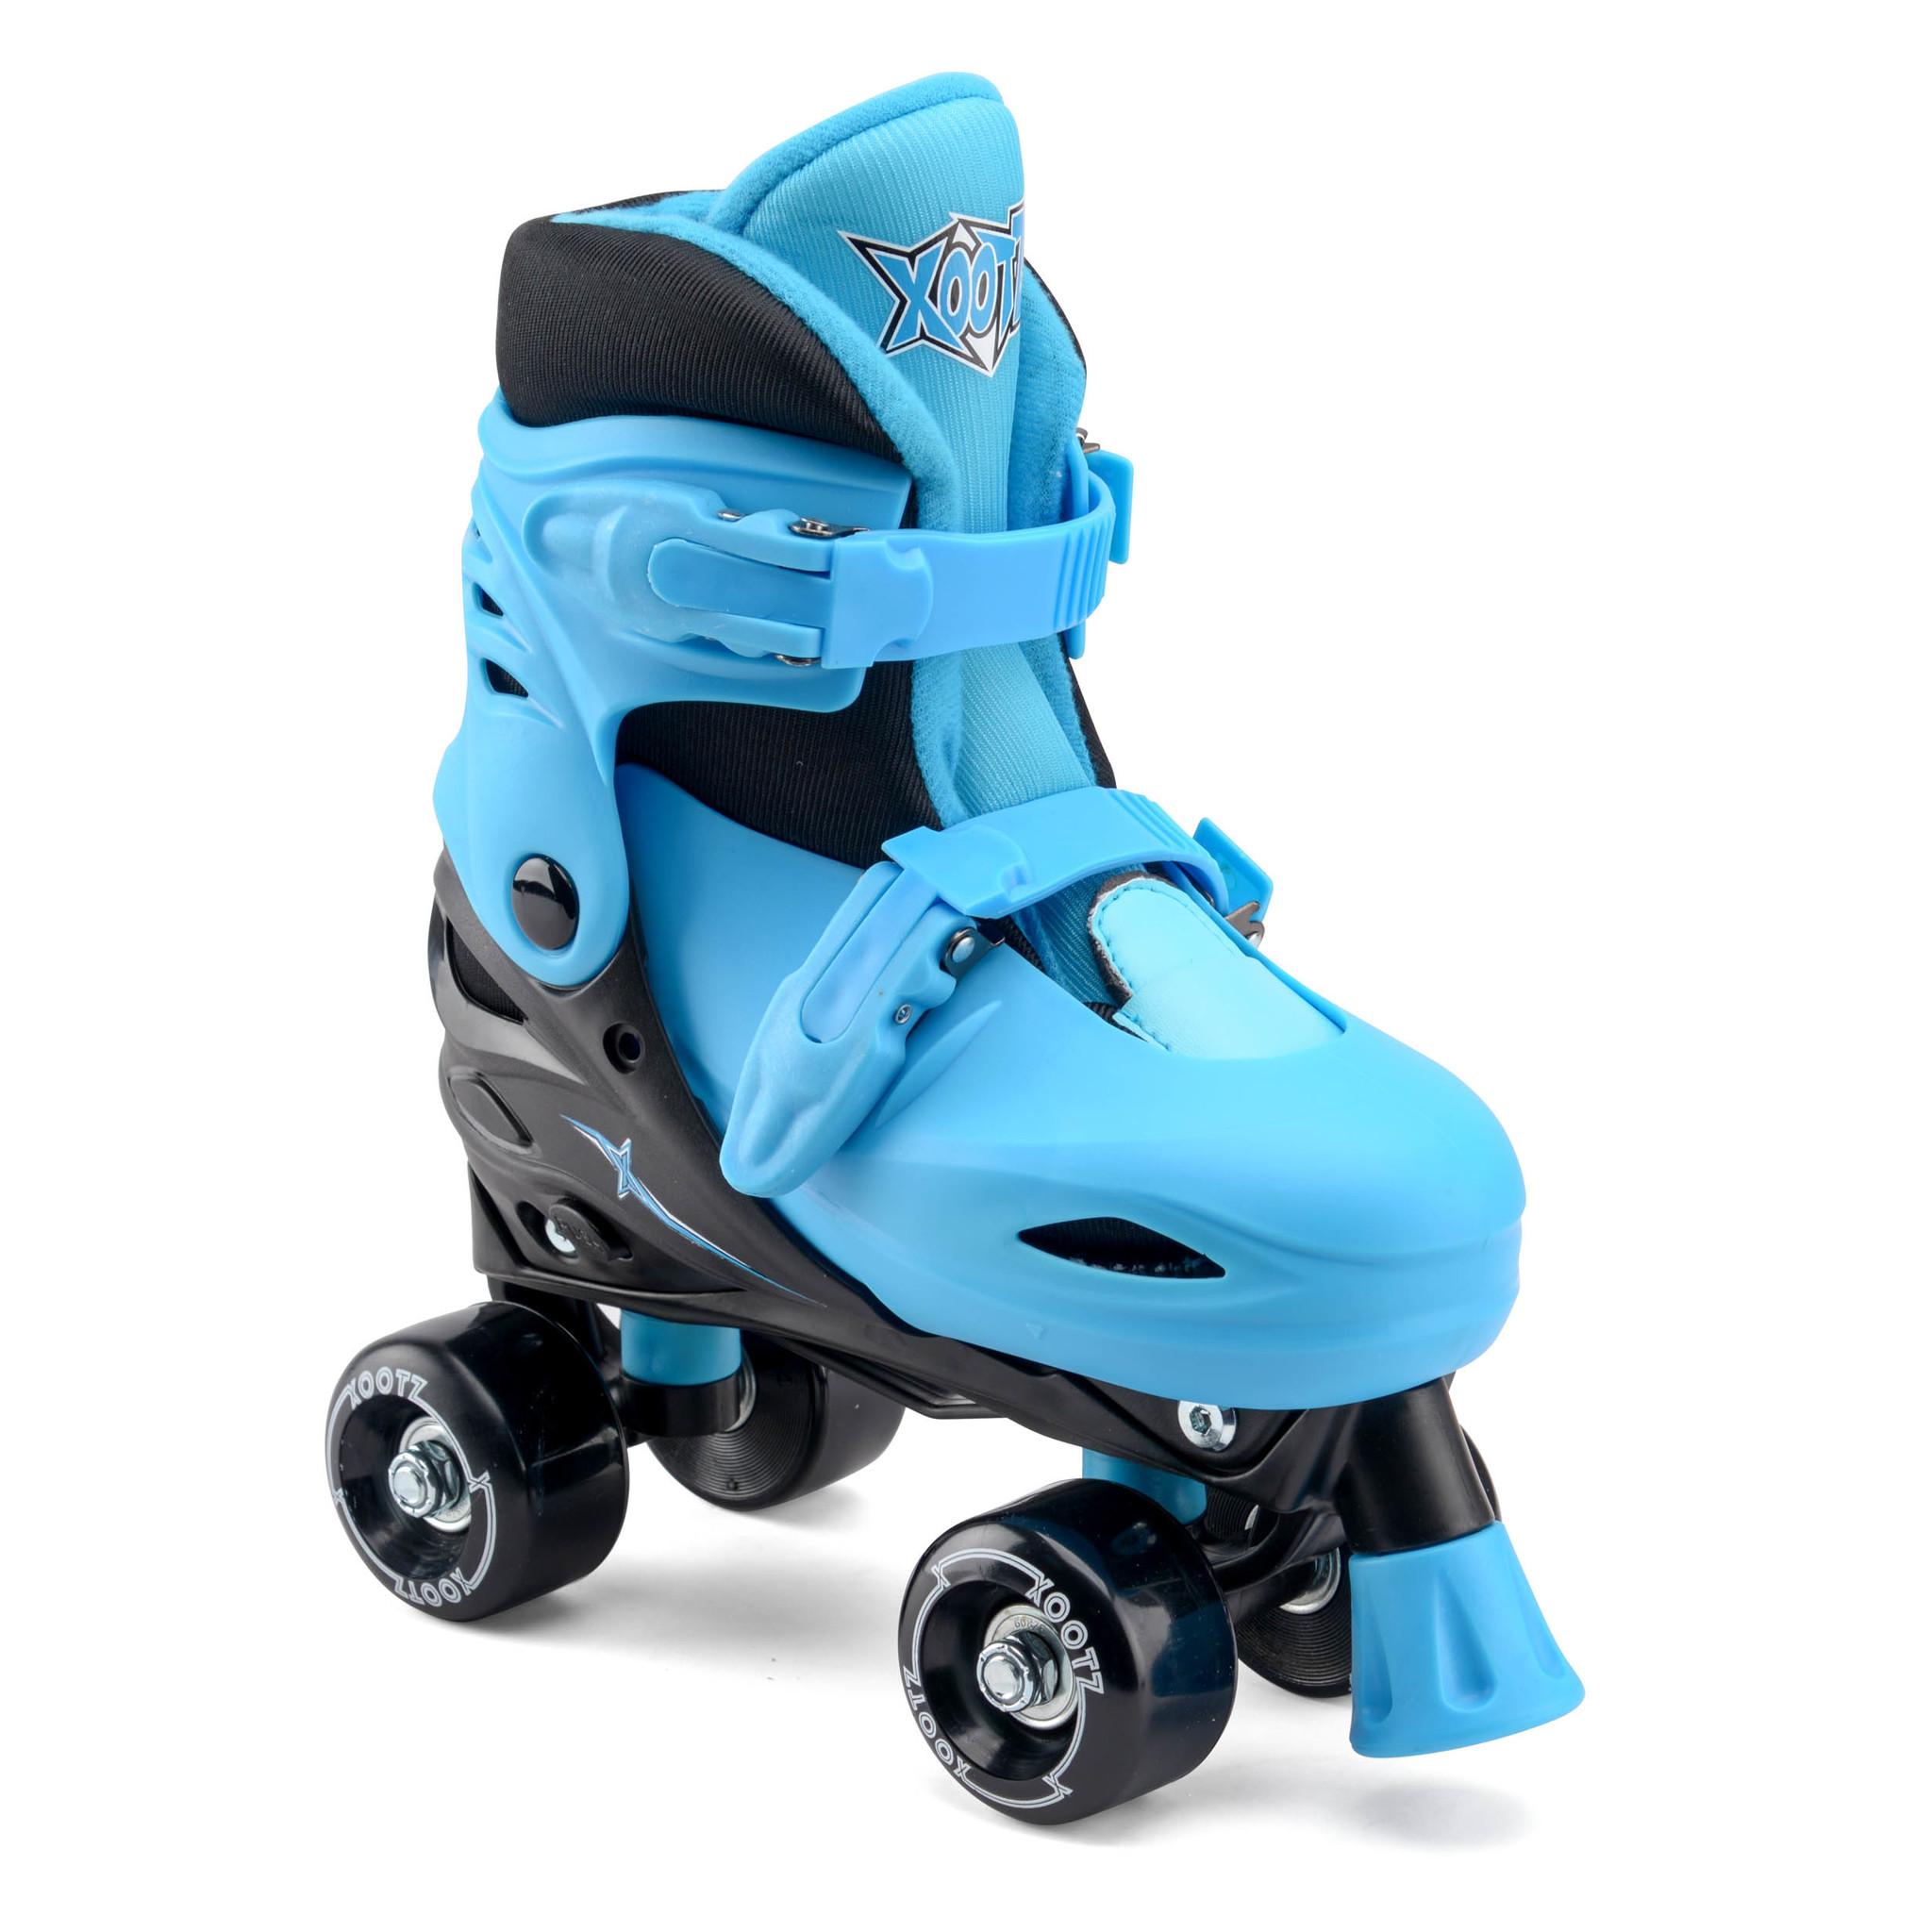 TY6064_xootz_quad_skates_blue